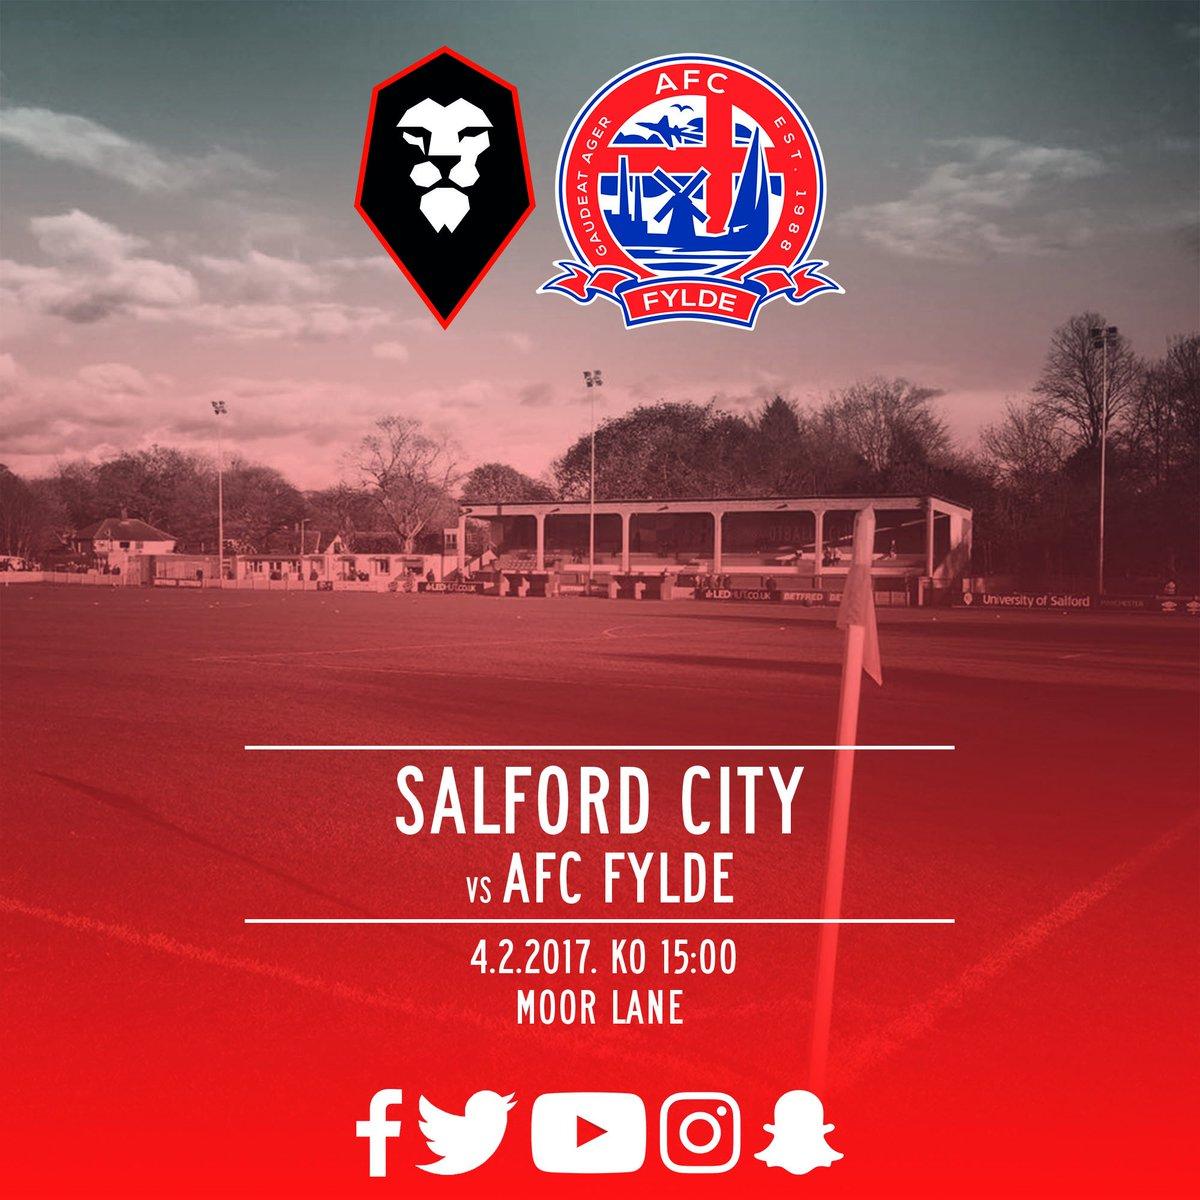 Salford City: Salford City FC (@SalfordCityFC) On Twitter